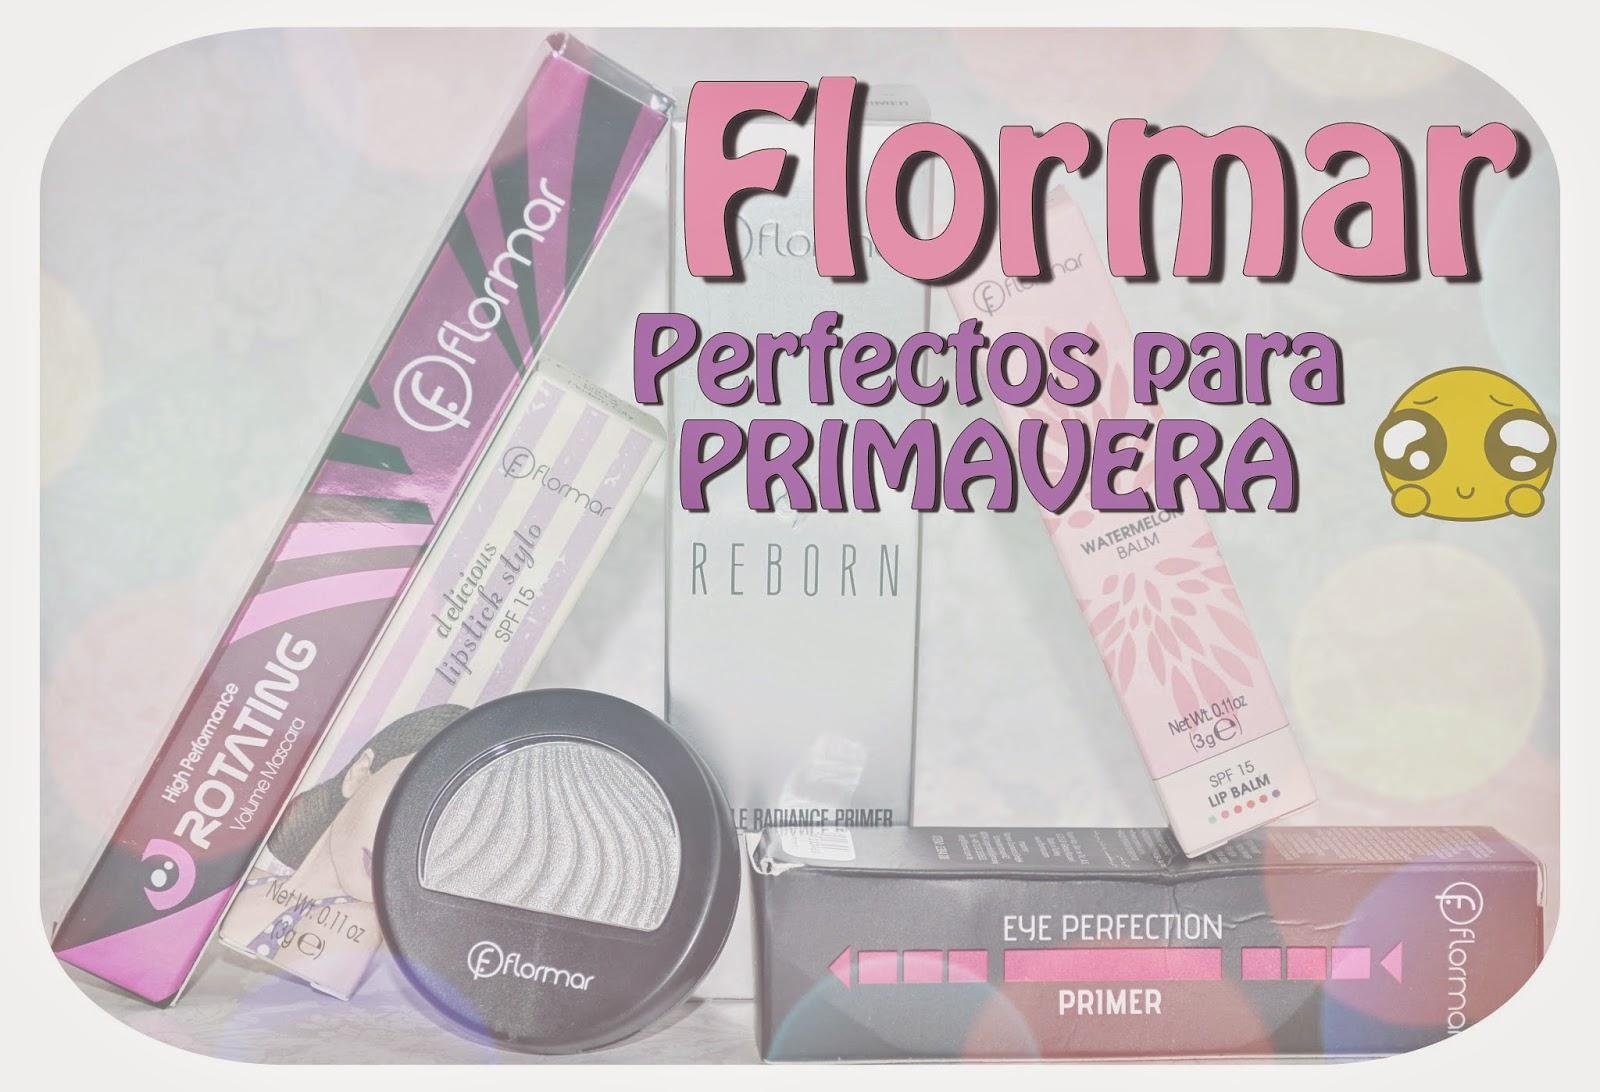 Flormar, maquillaje primavera 2015 perfectos basicos